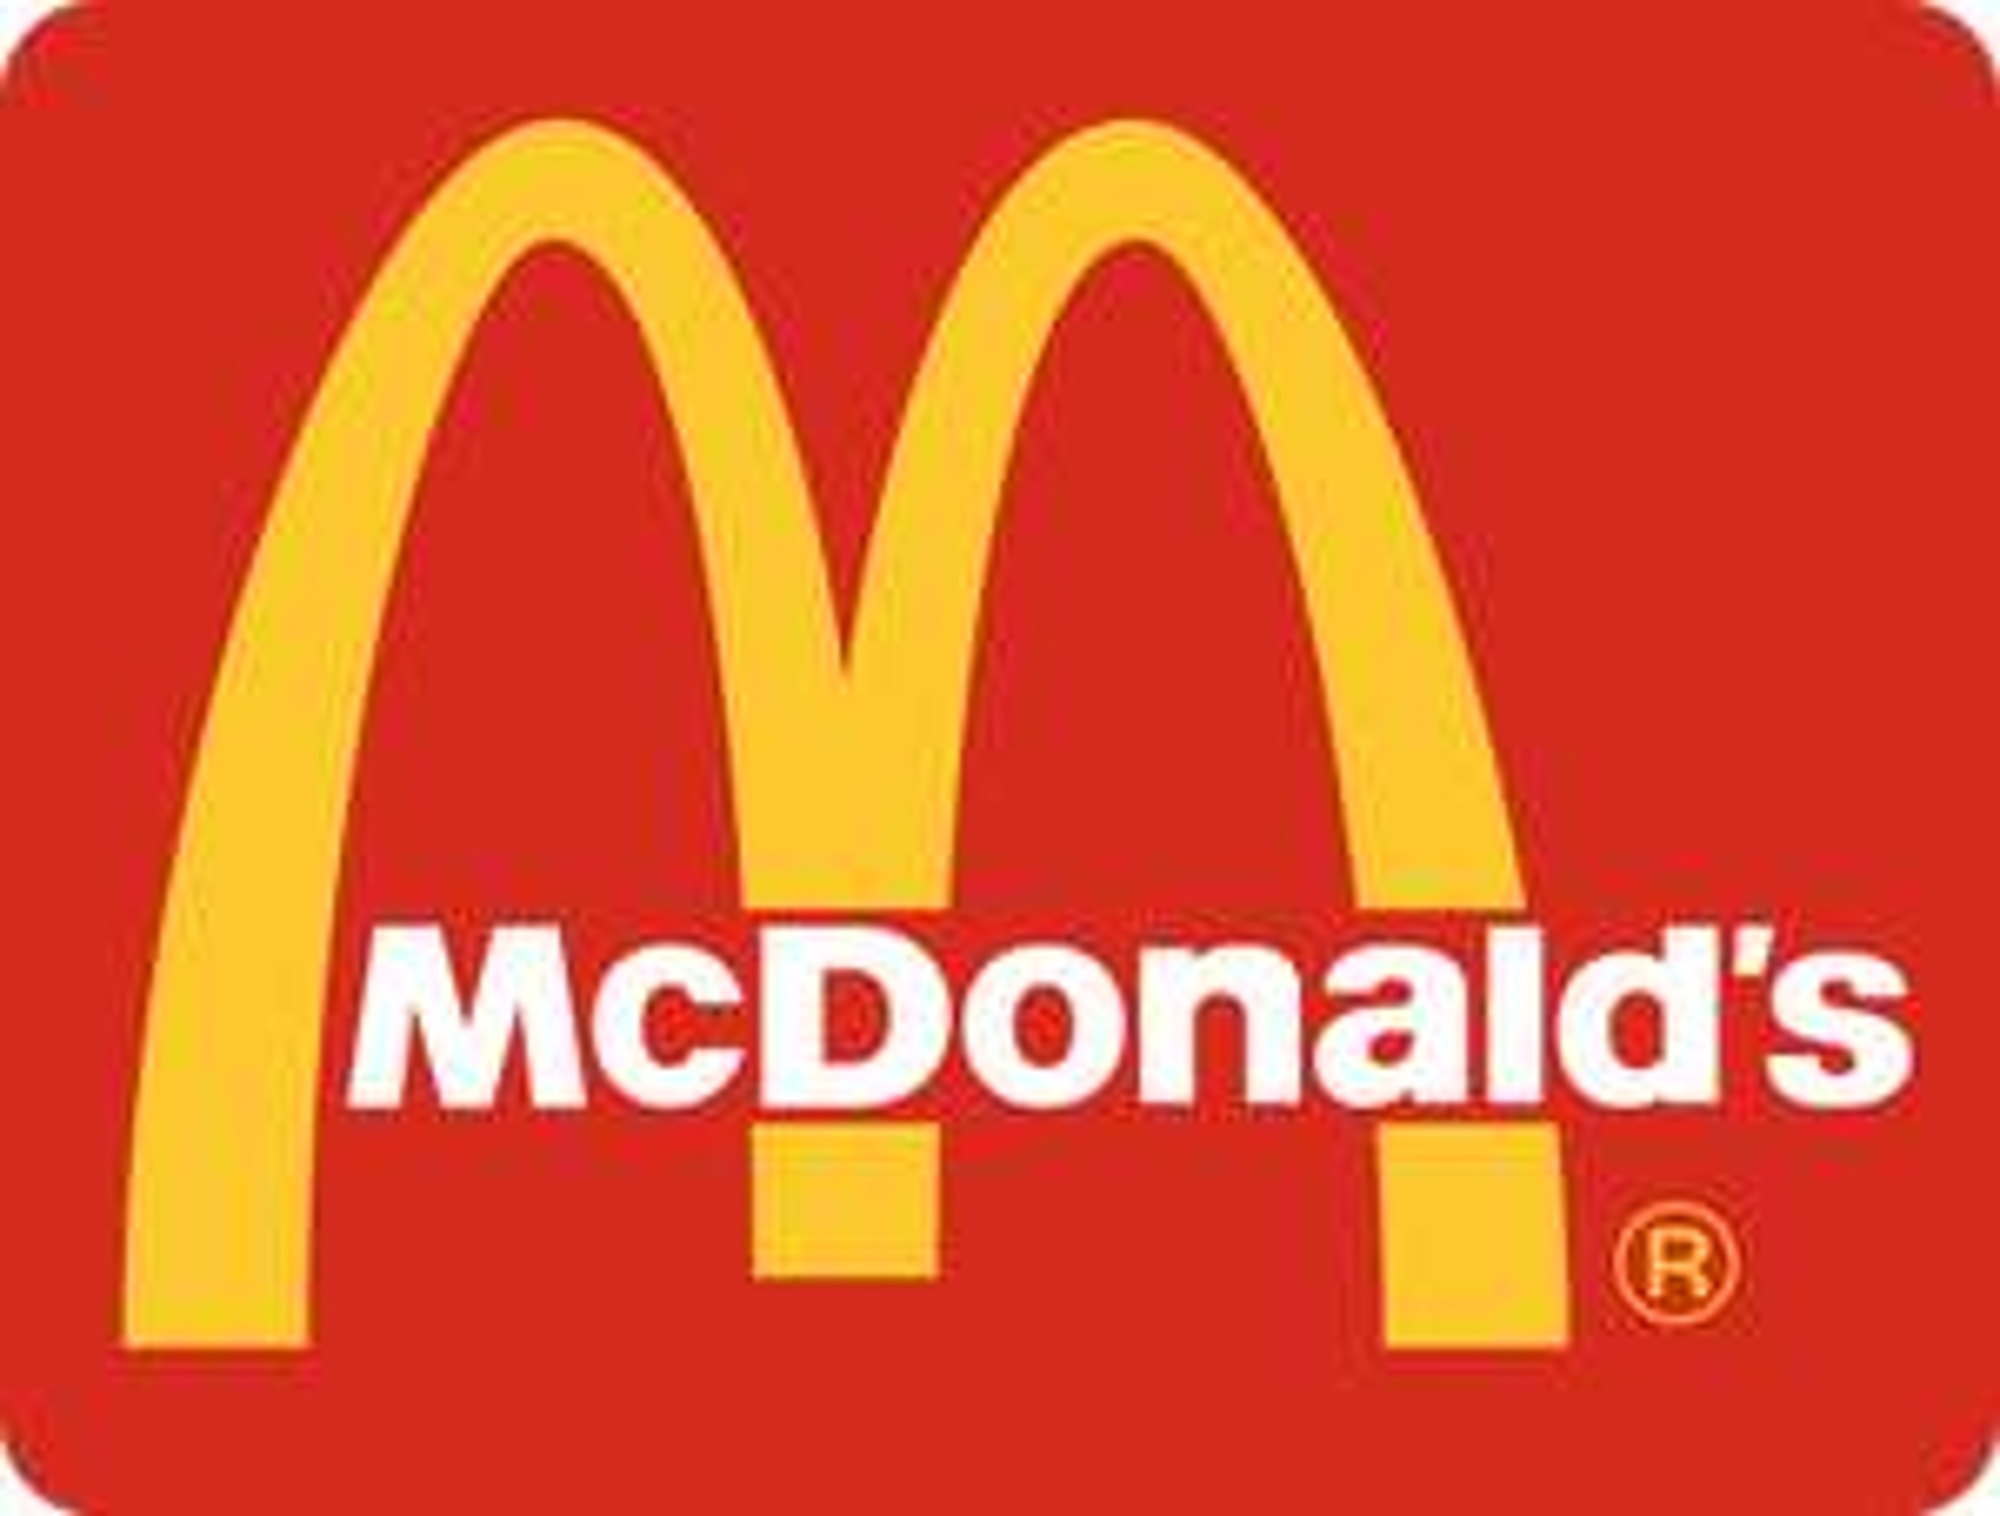 [McDonalds] Getränke Flatrate Softdrink oder Kaffee